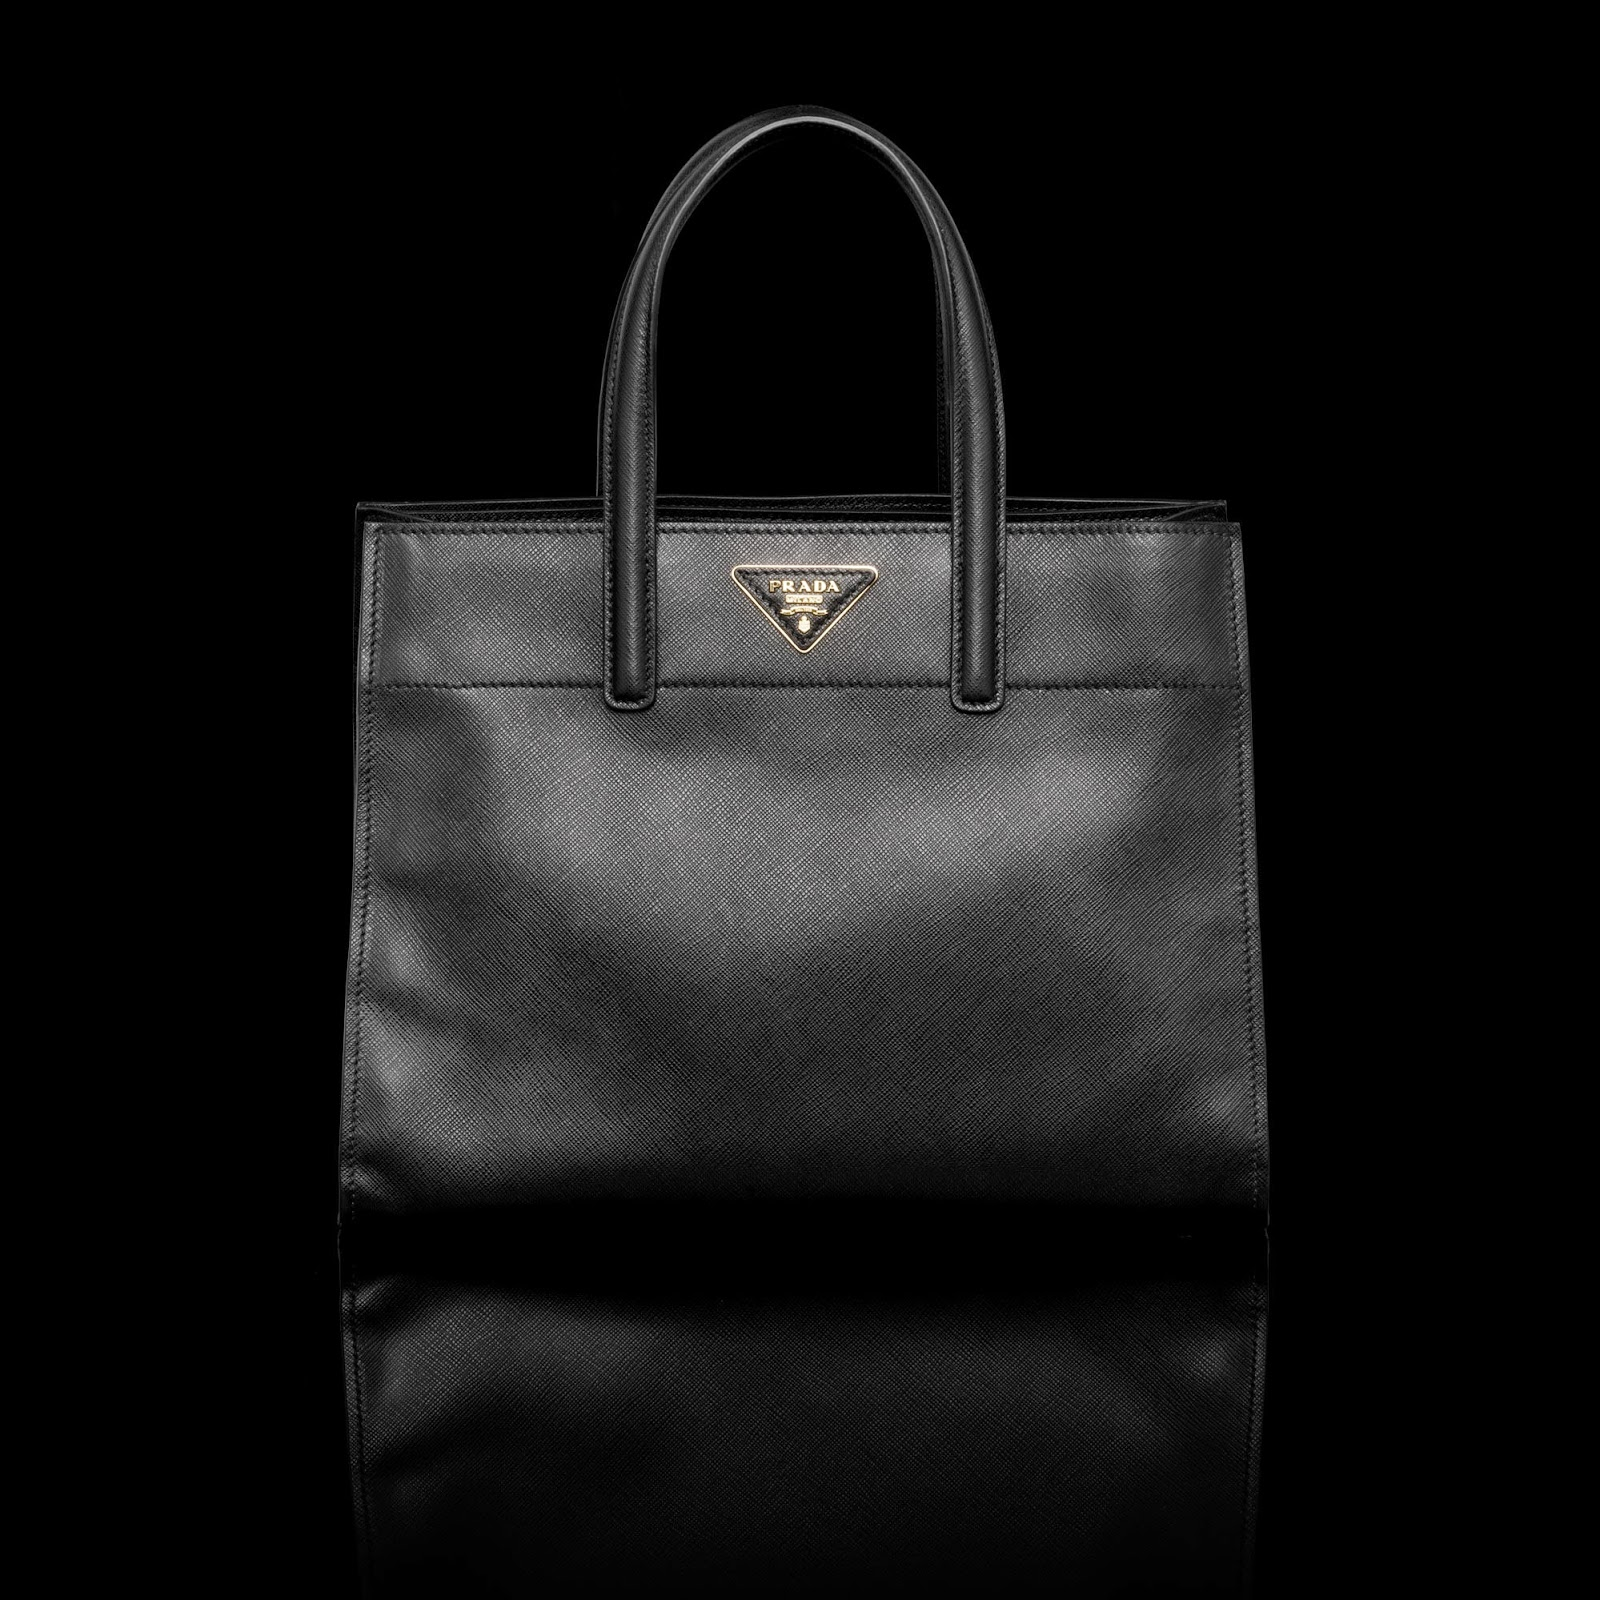 spot fake prada - Neo LUXuries: PRADA Small Saffiano Soft Leather Tote - BN2606